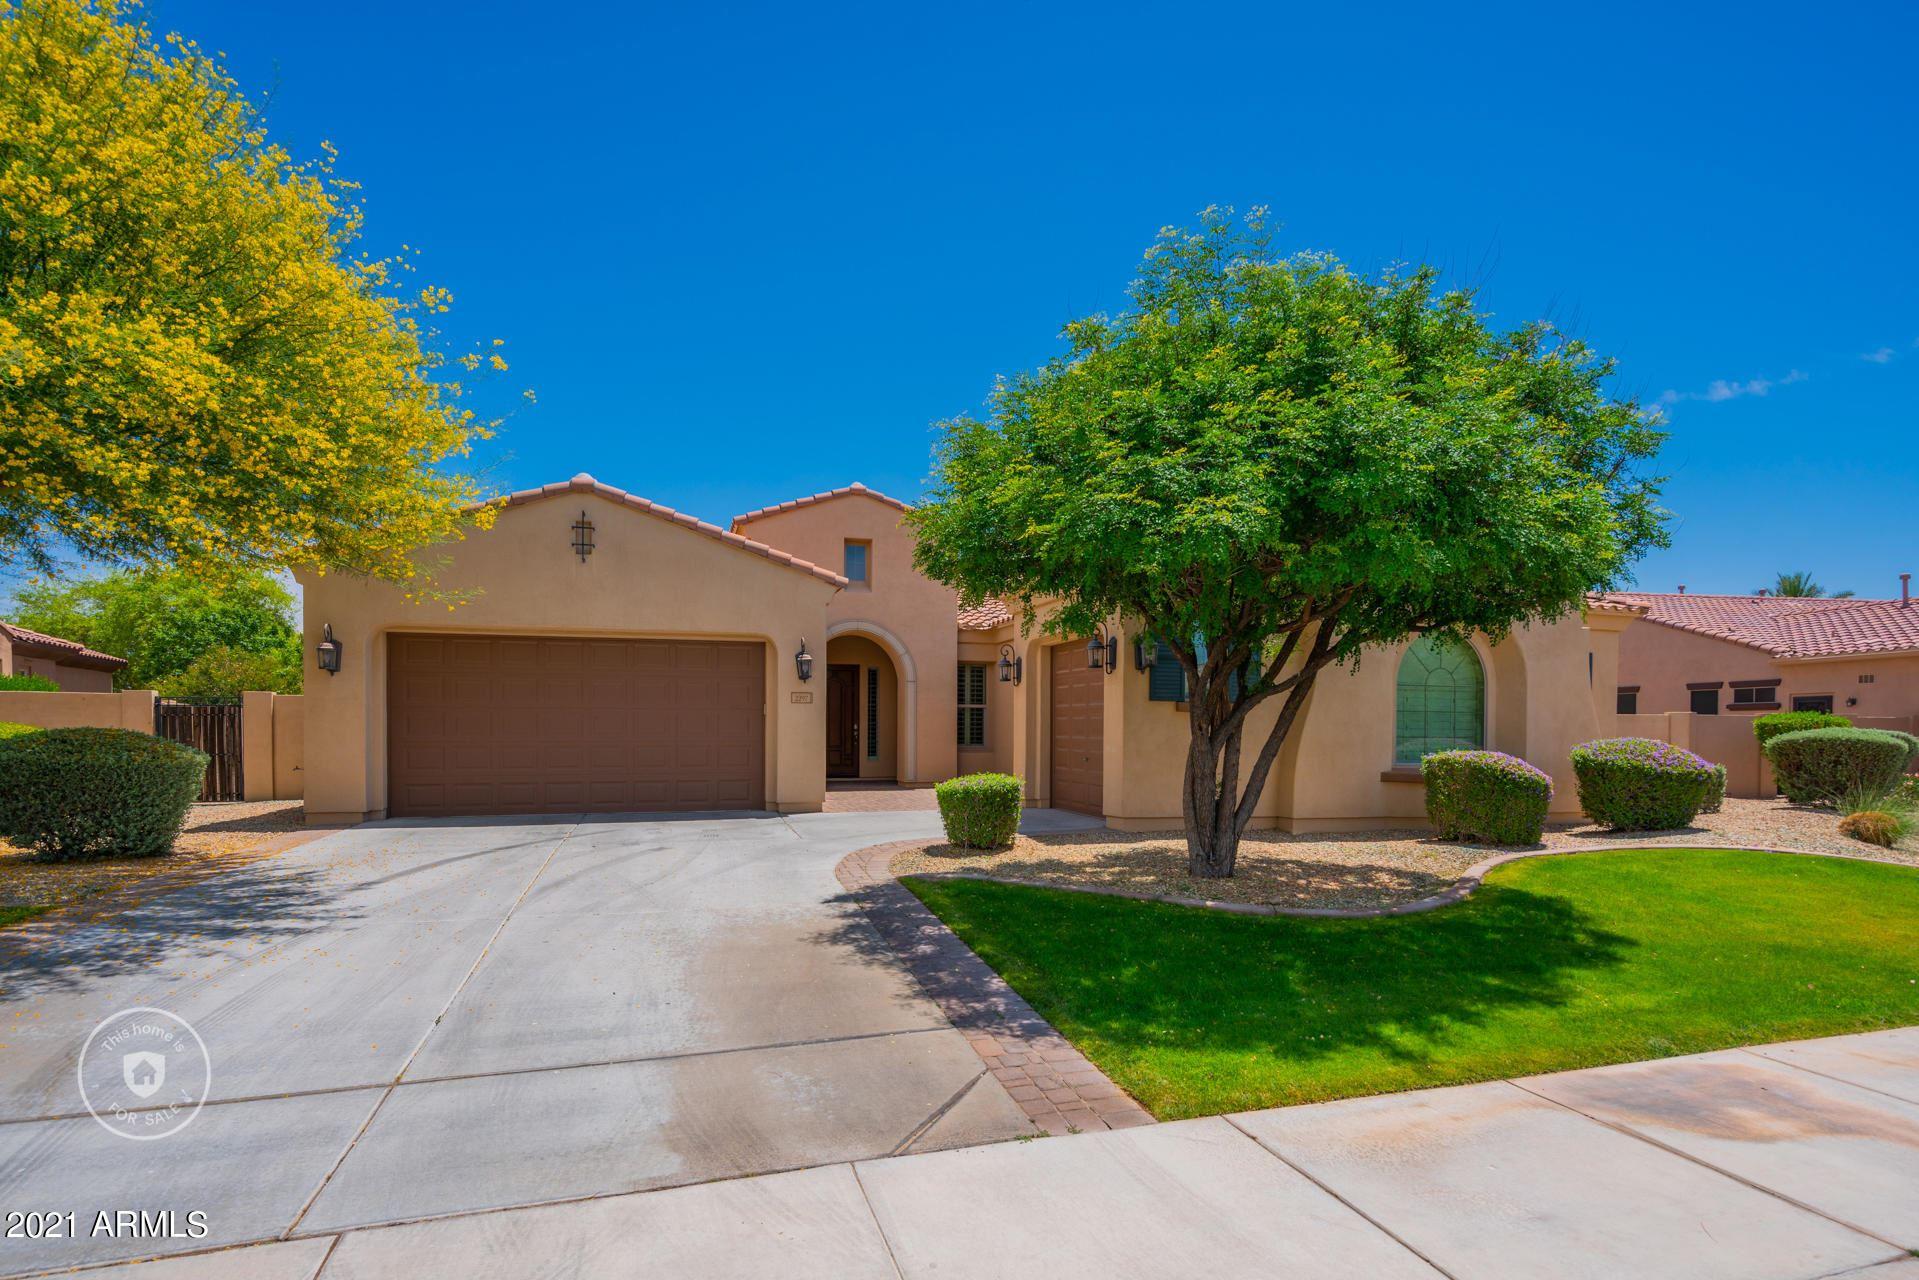 Photo of 2297 N 158TH Drive, Goodyear, AZ 85395 (MLS # 6232095)